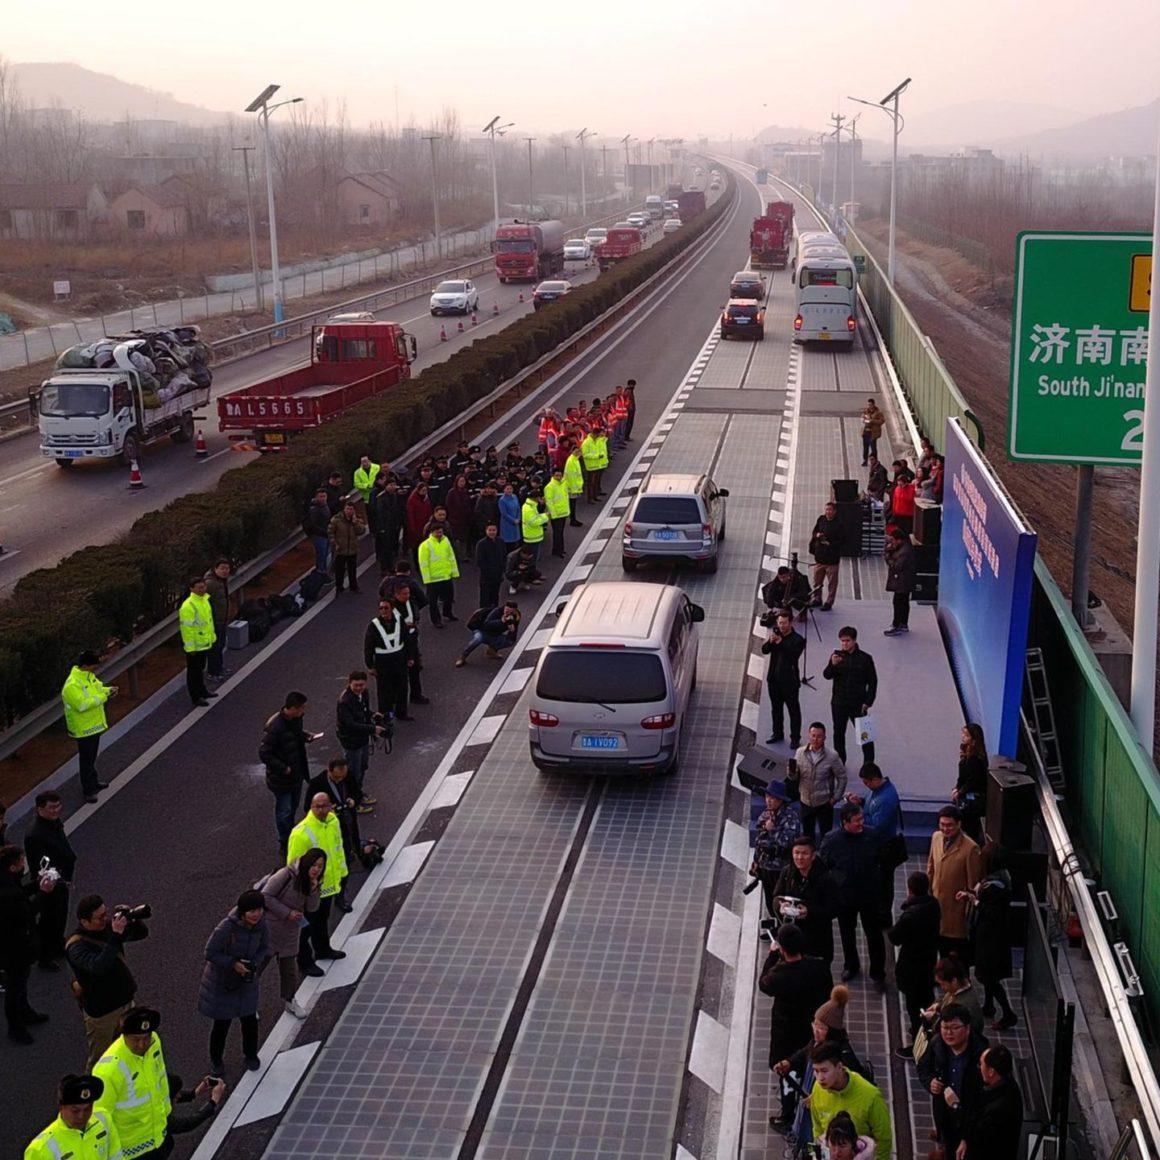 Autobahn mit Fahrbahn aus Solarmodulen in China